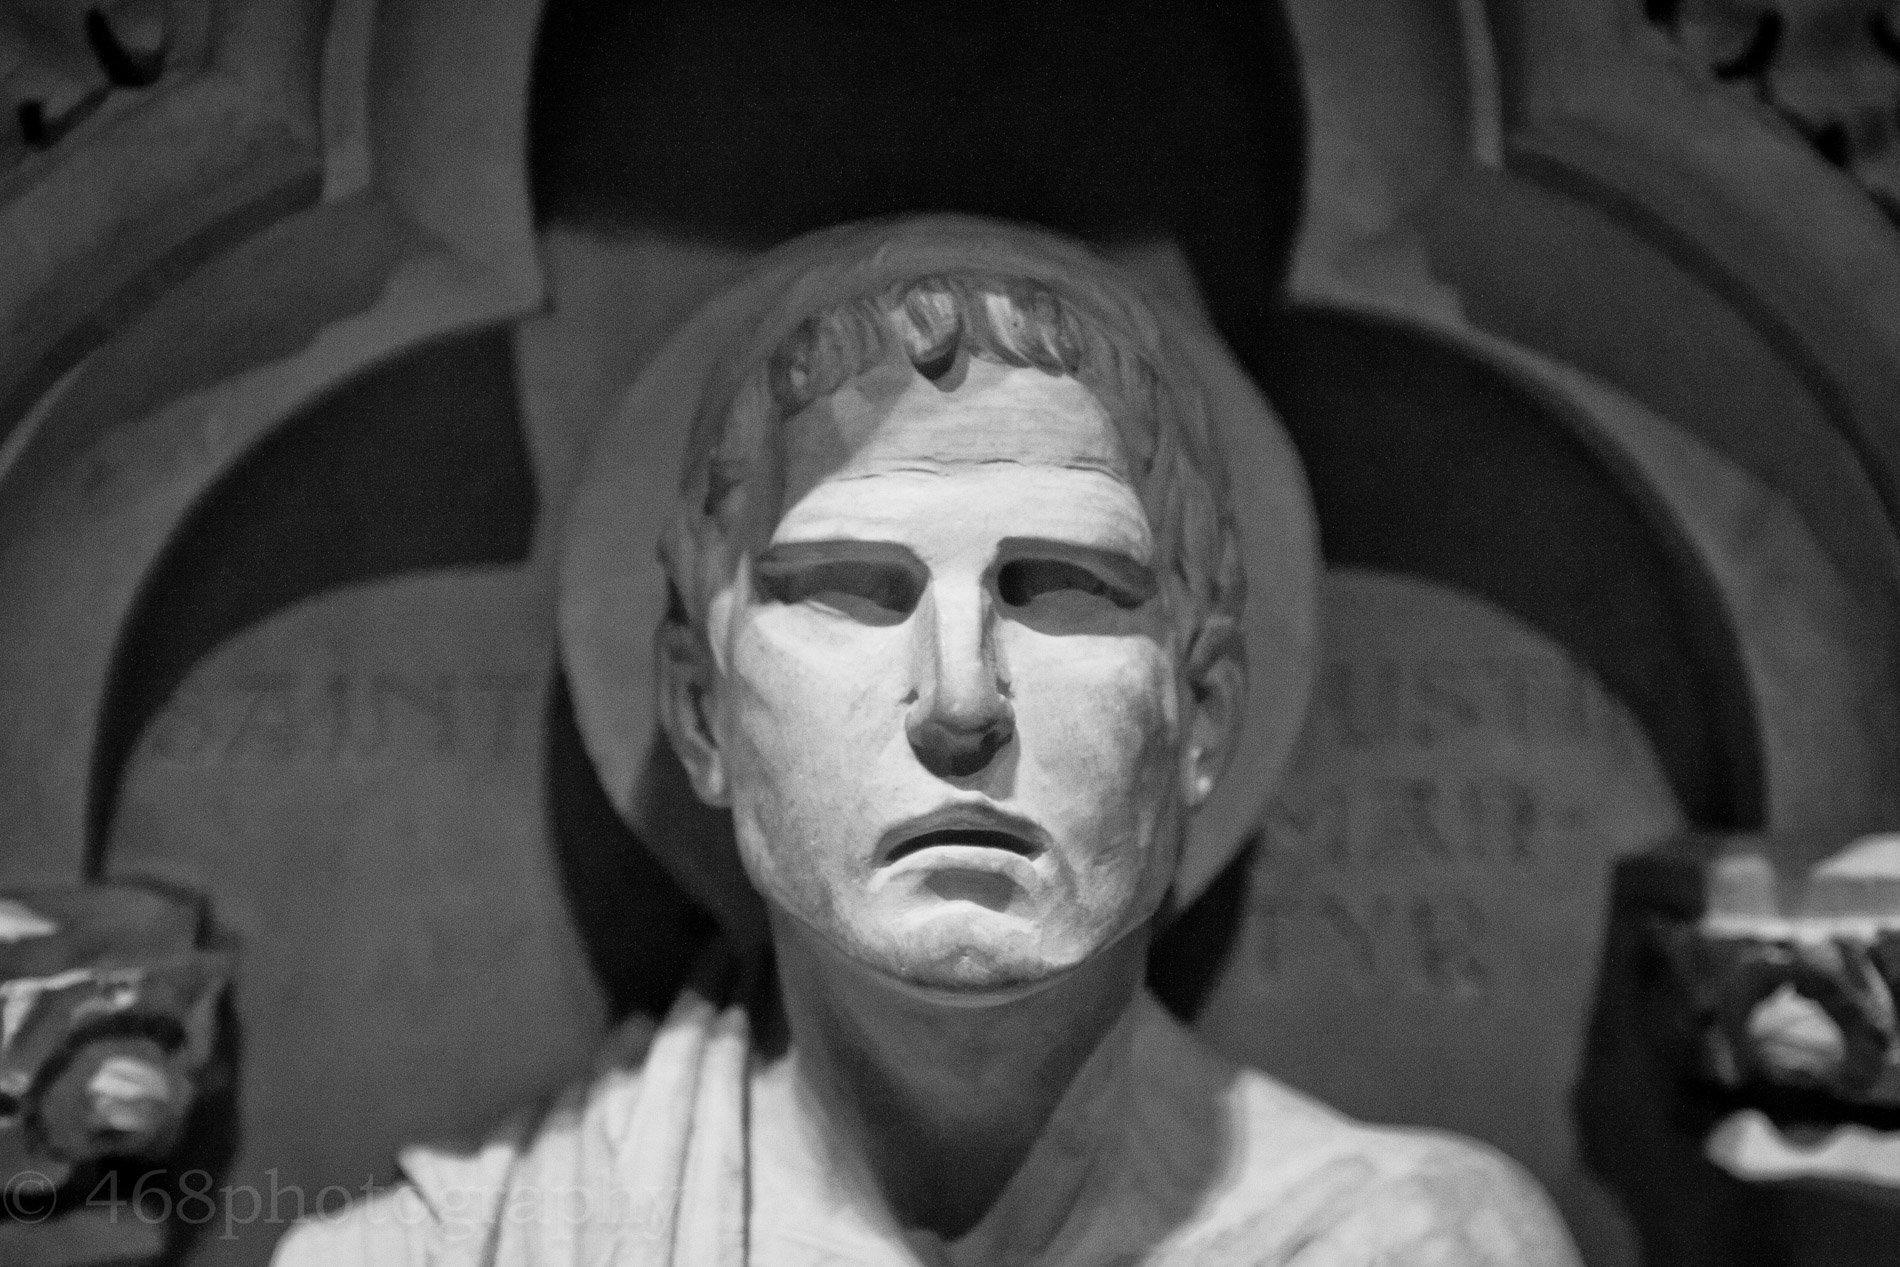 statue St. Justin Martyr Rome Martyrdom June 1